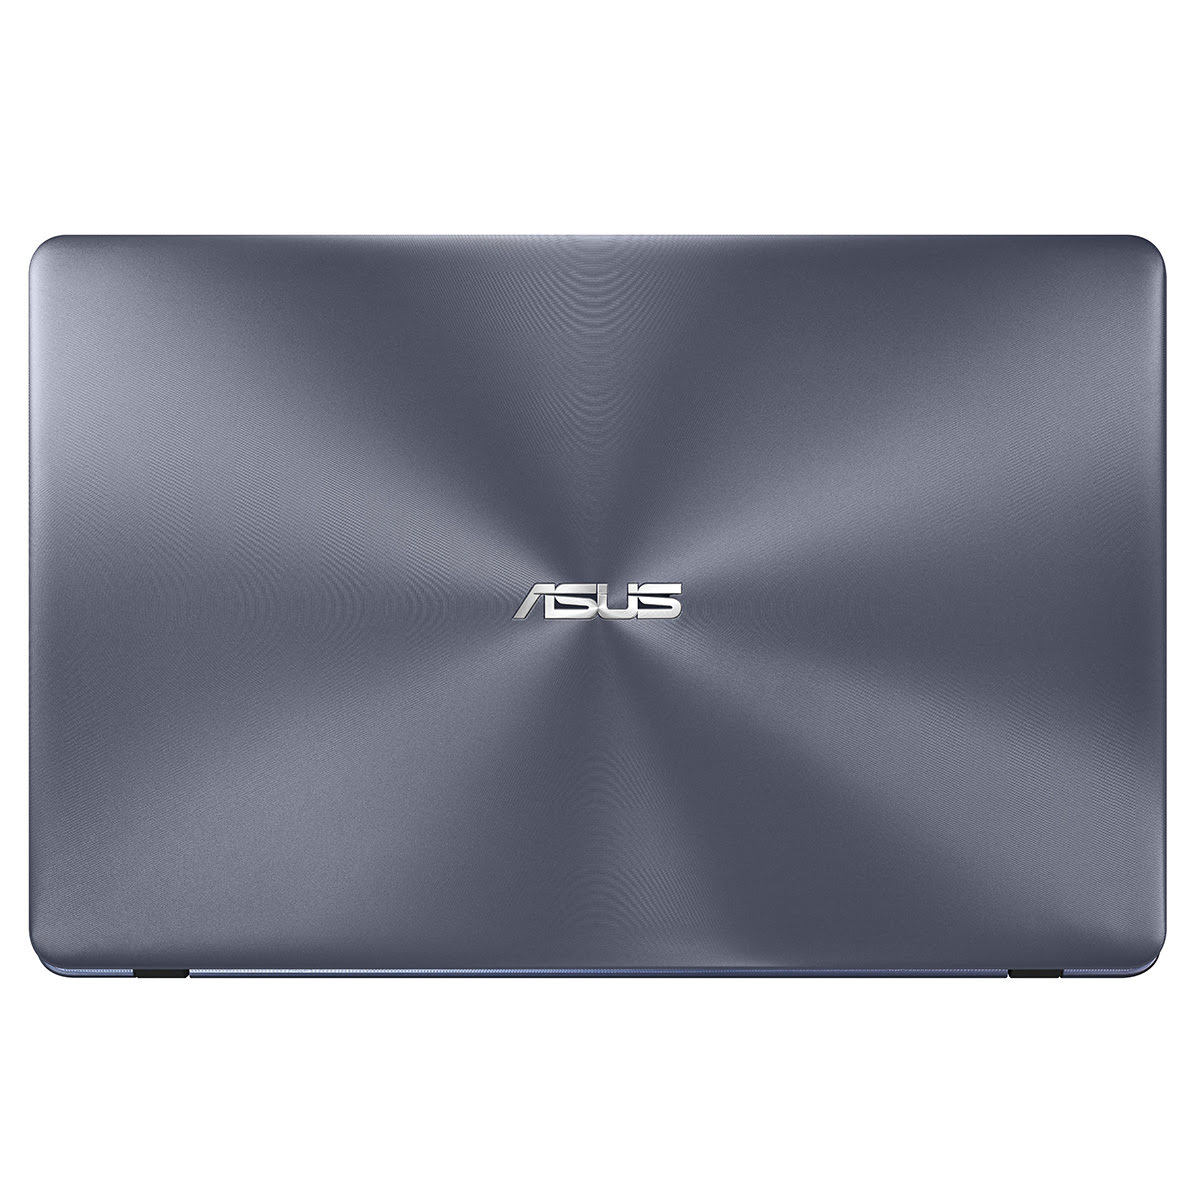 Asus 90NB0EV1-M04870 - PC portable Asus - Cybertek.fr - 2